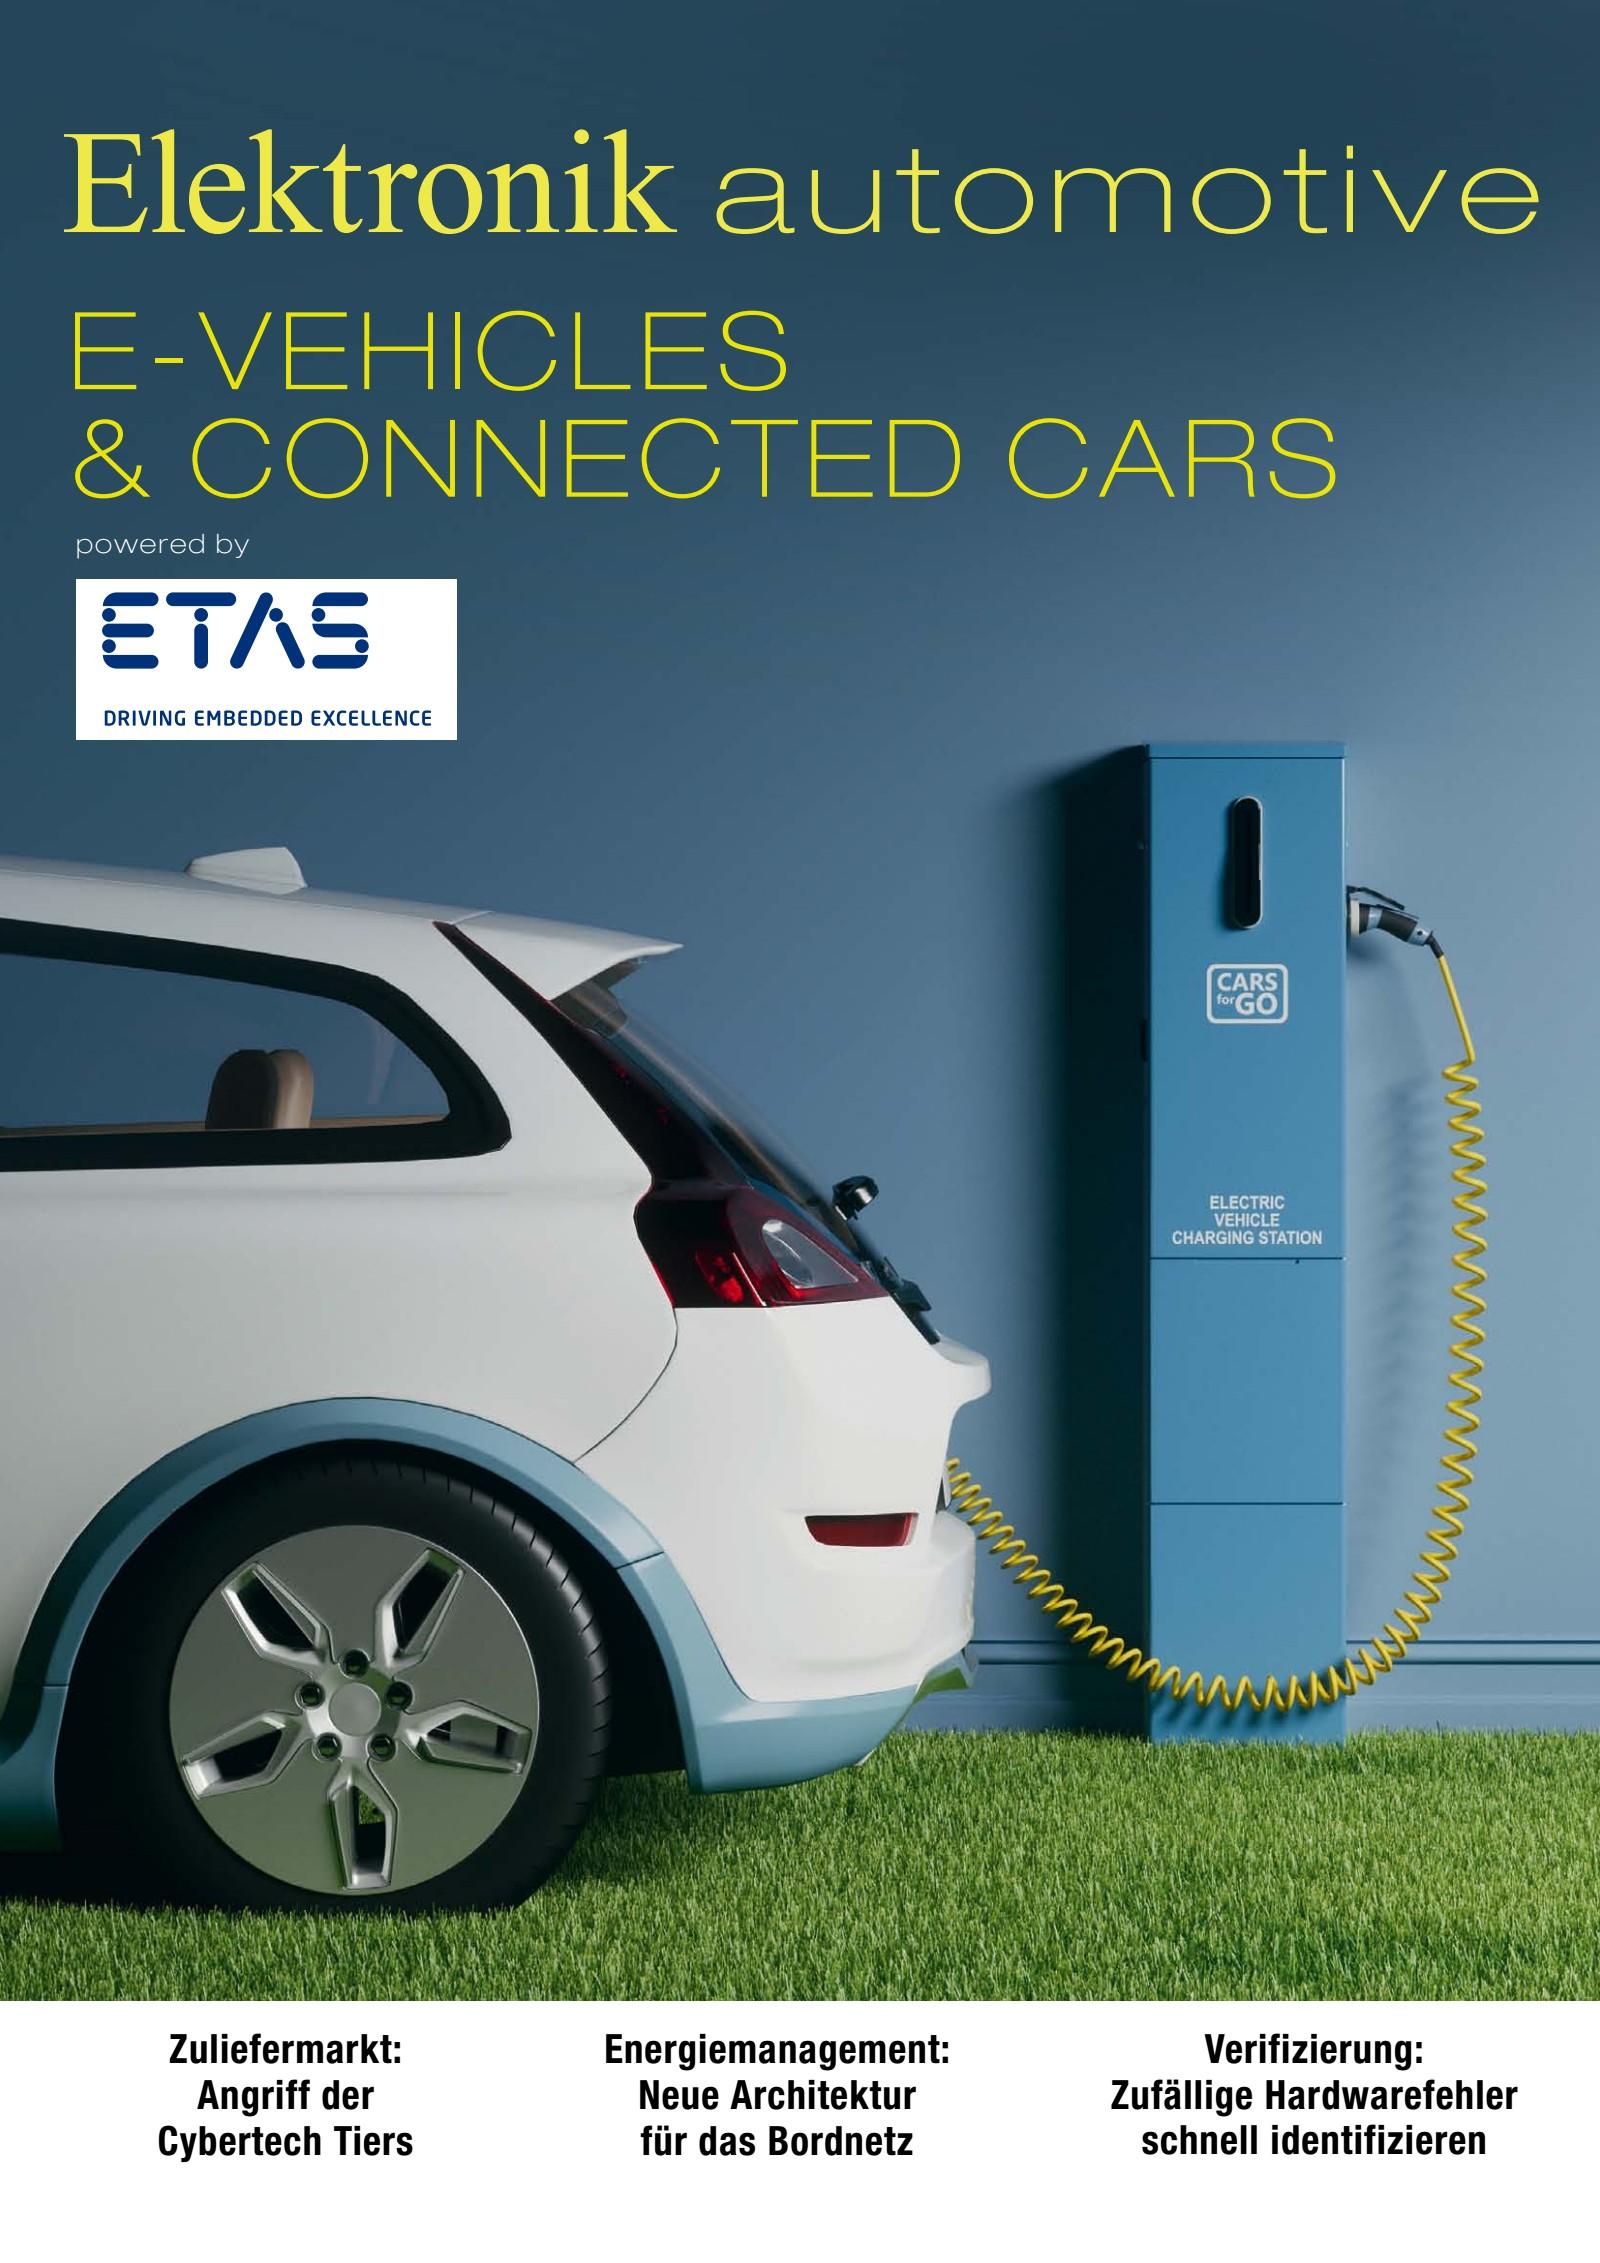 Elektronik automotive 01-02/2021 Digital